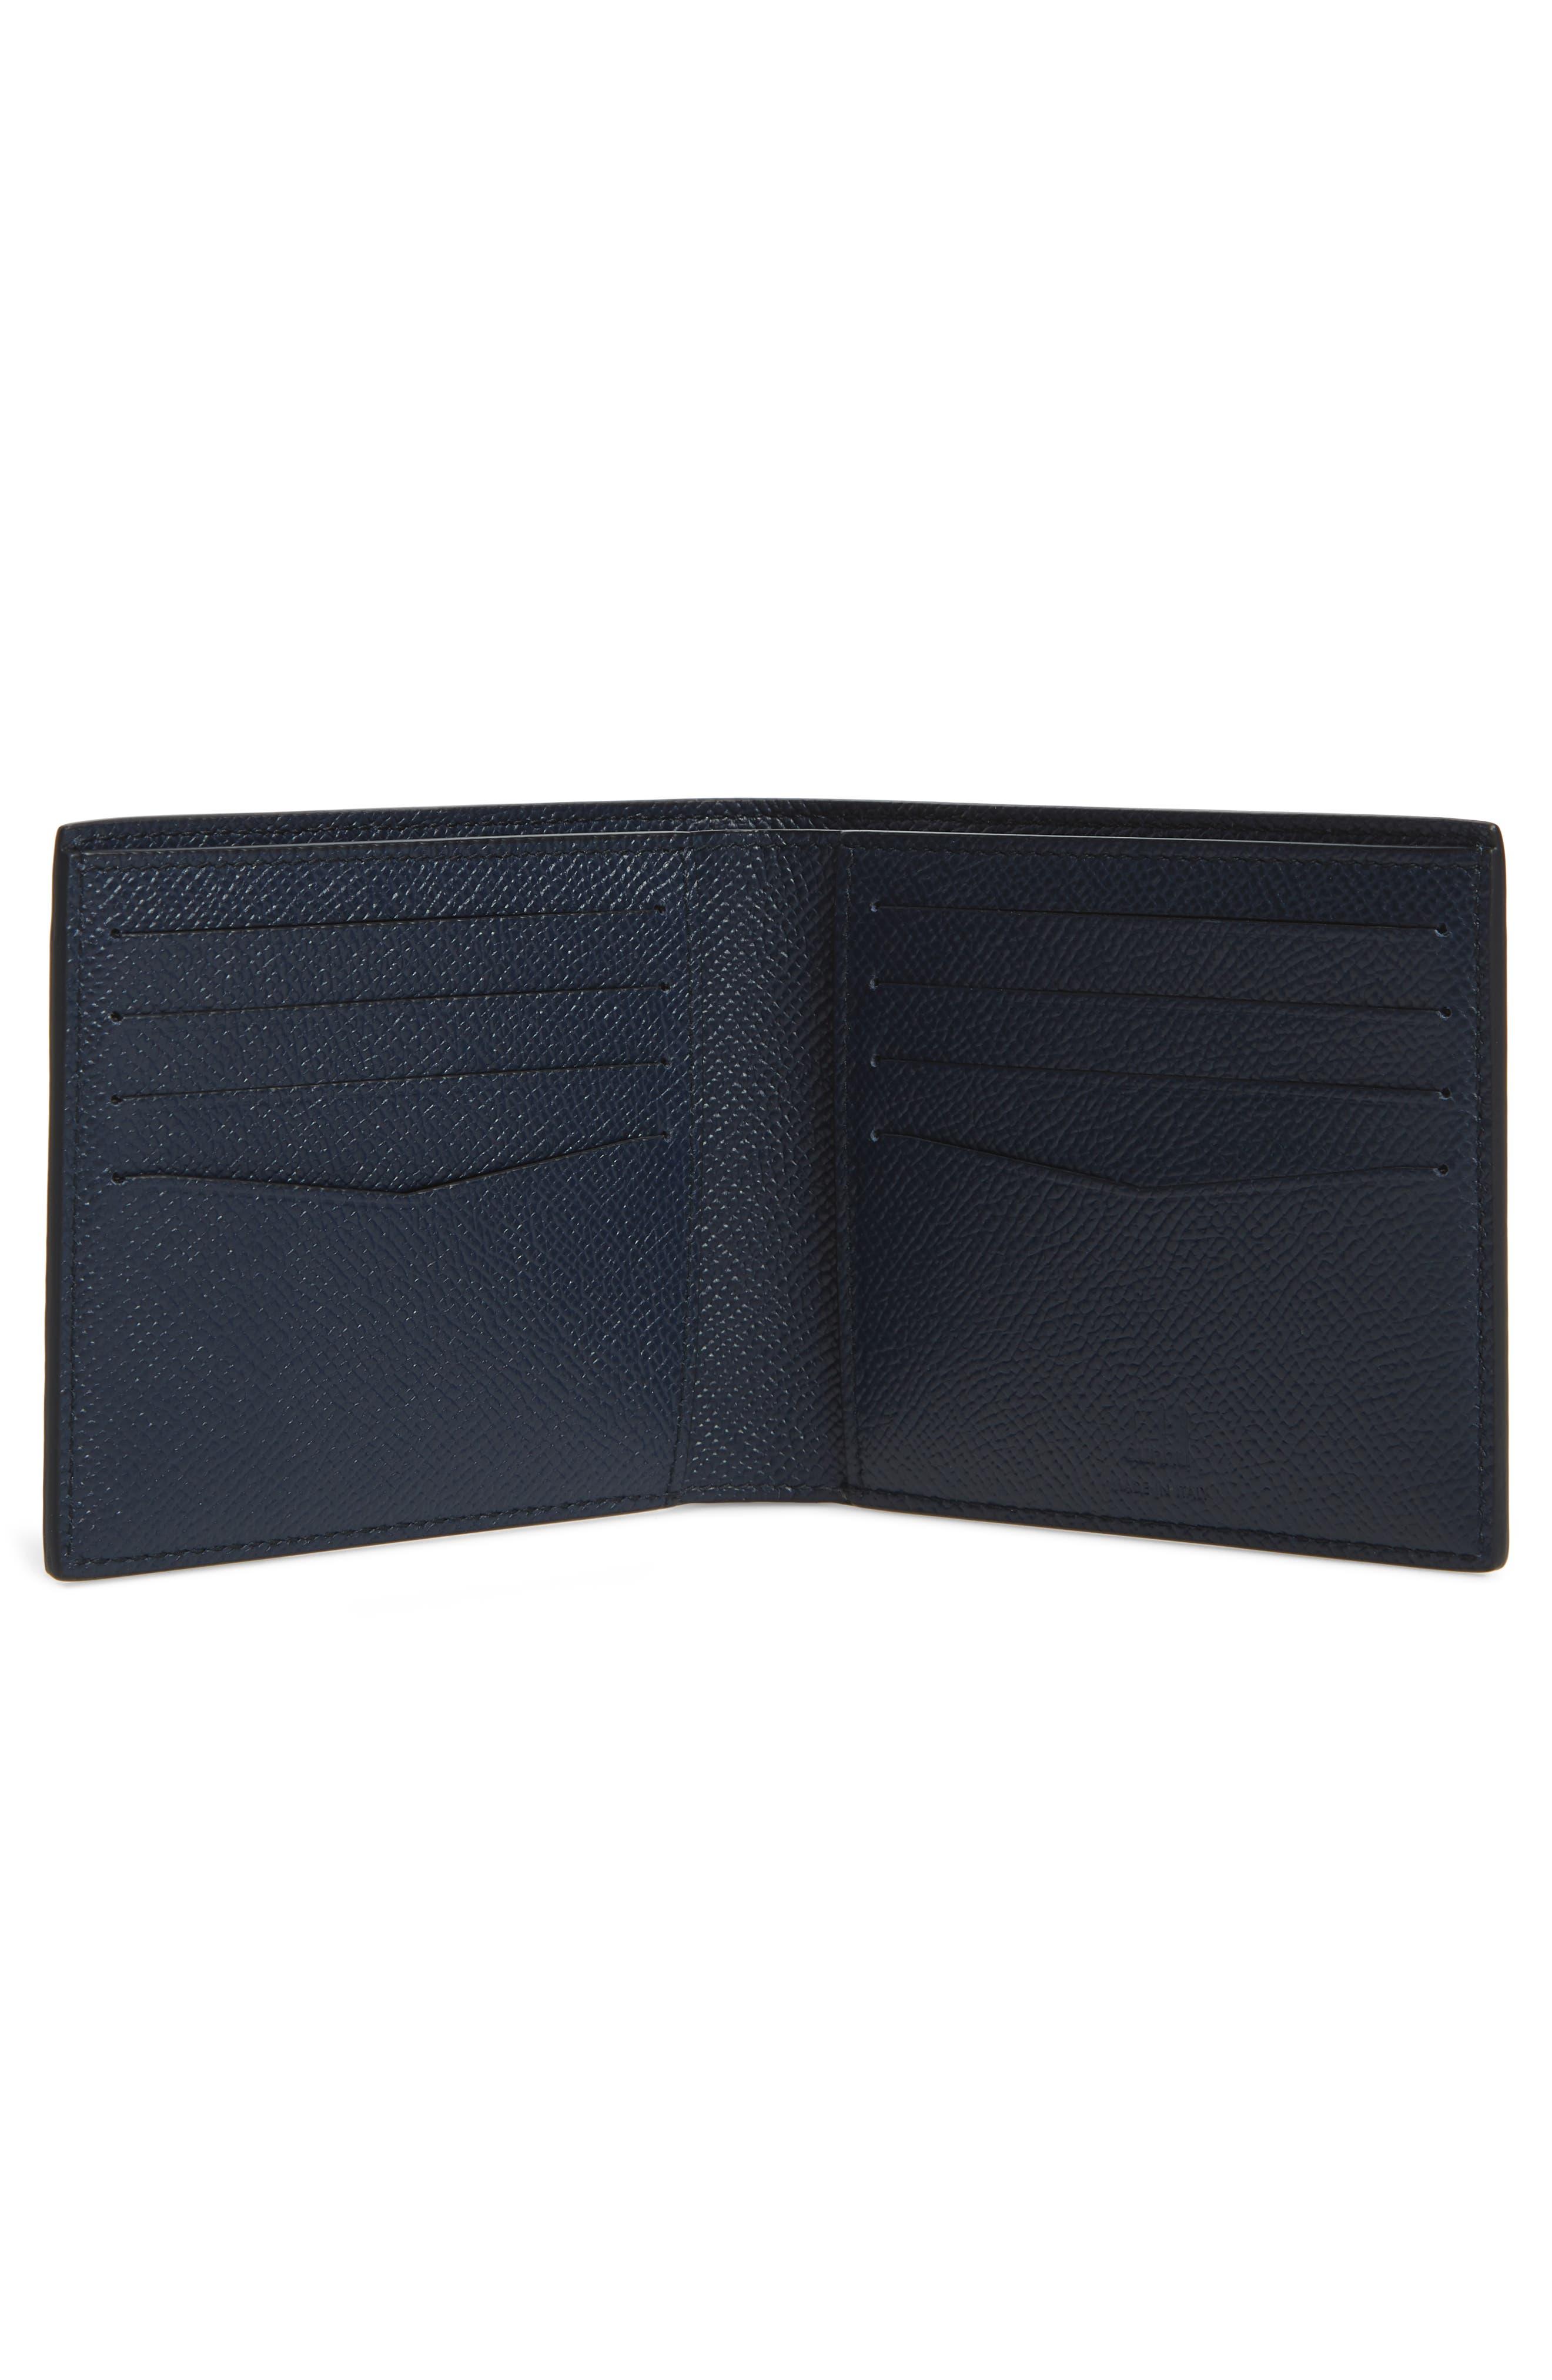 DUNHILL, Cadogan Leather Wallet, Alternate thumbnail 2, color, STONE BLUE